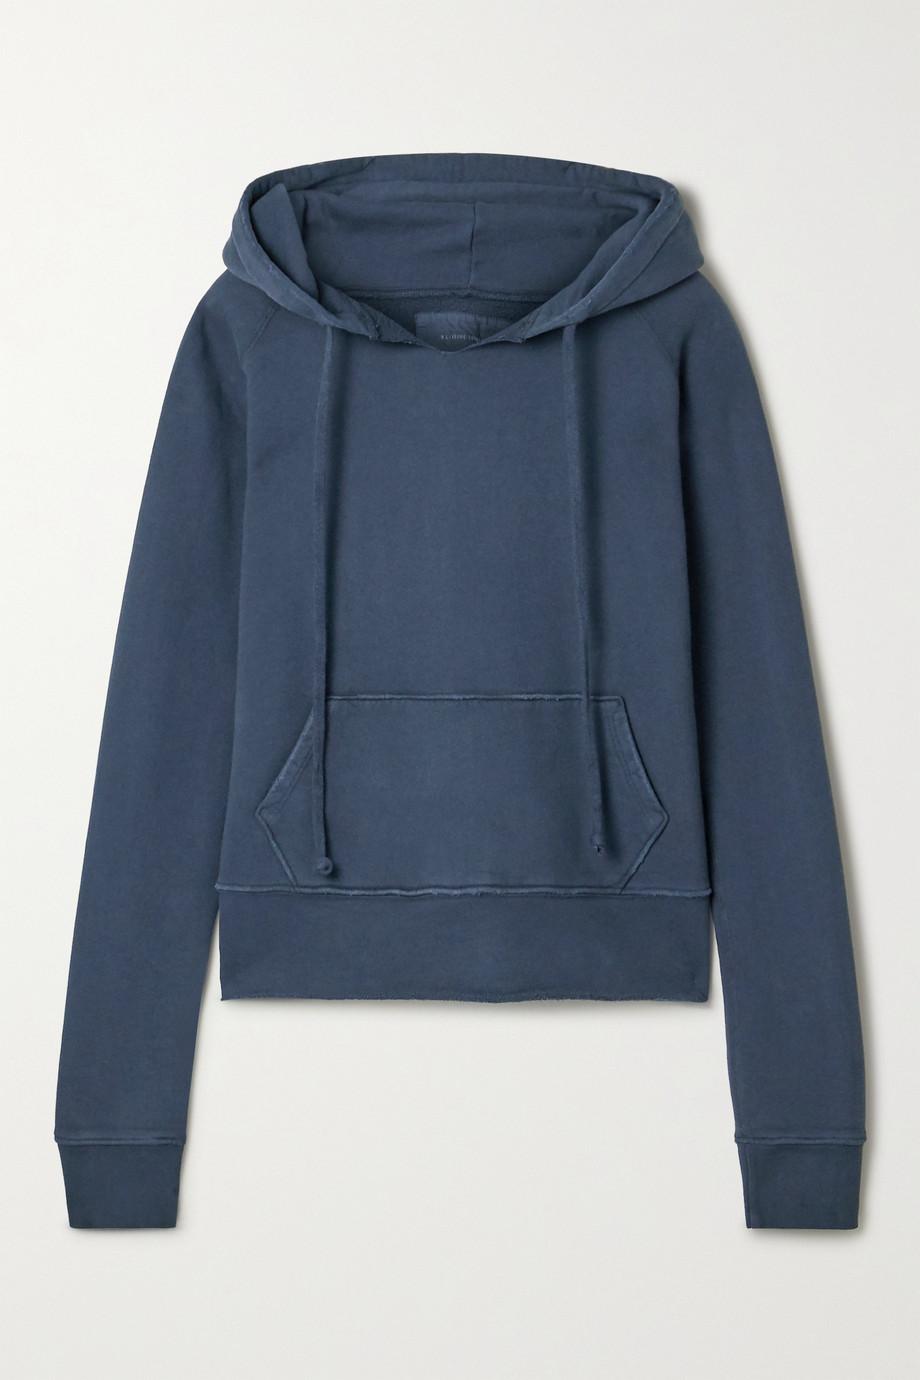 Nili Lotan Rayne cotton-jersey hoodie